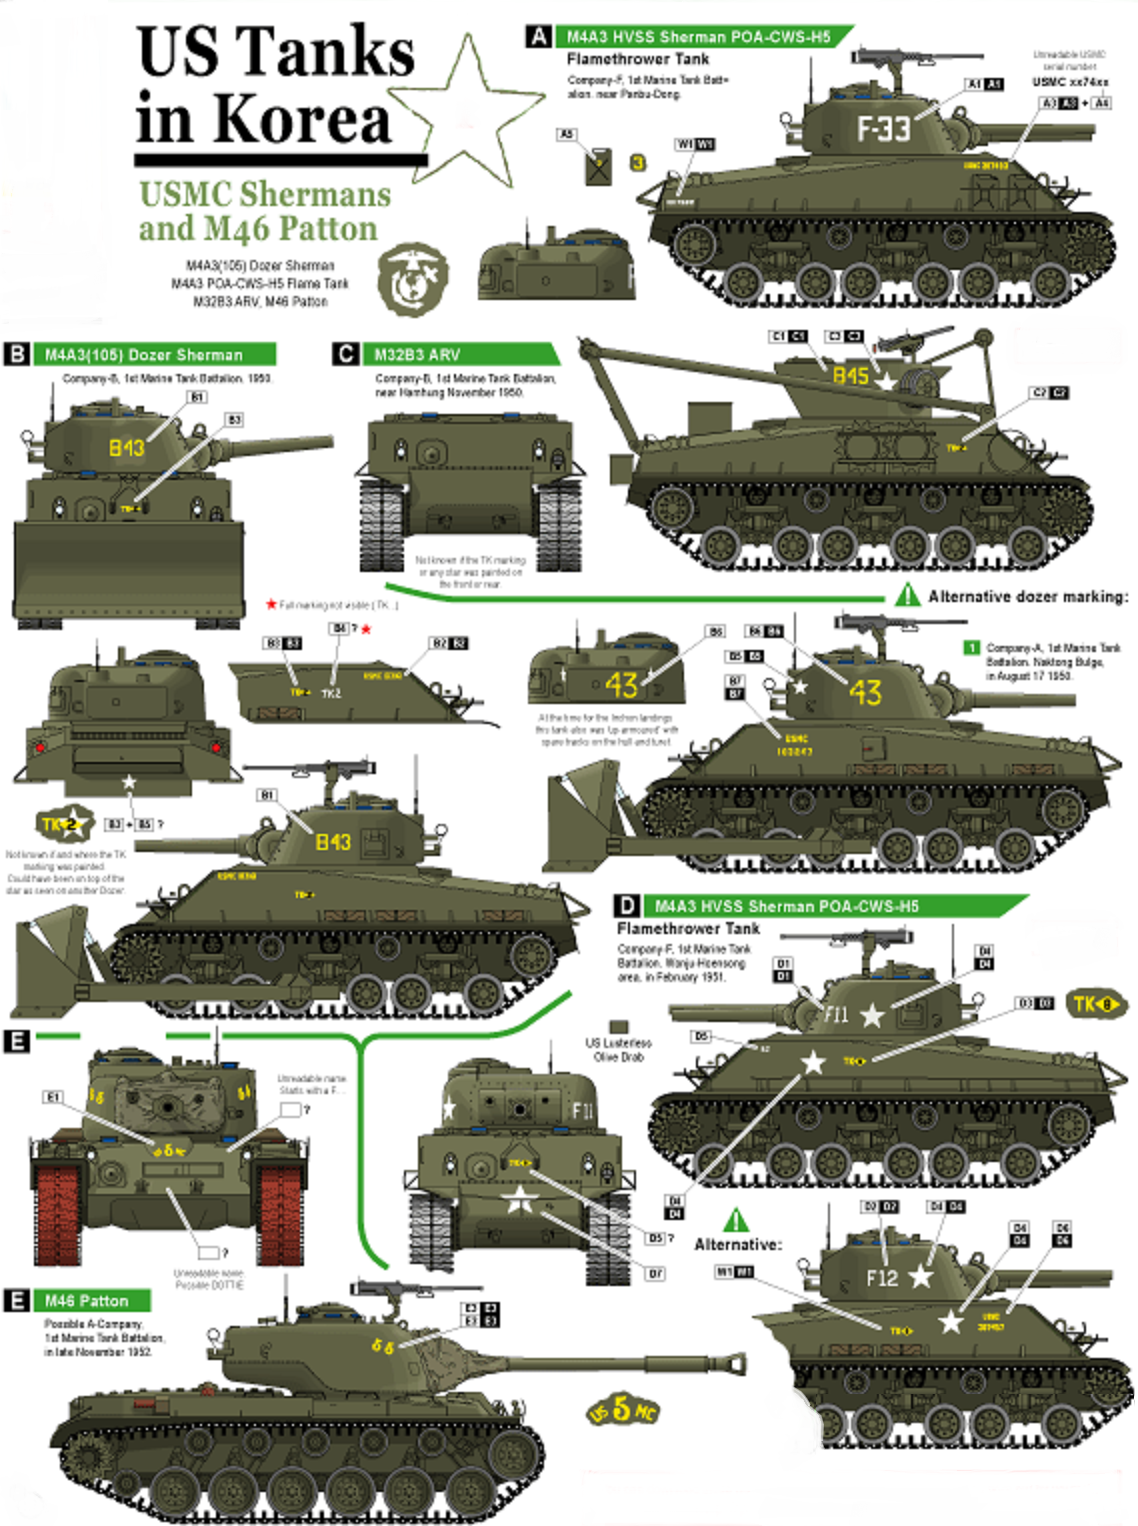 Korean War Tanks - via Mita Block, from Barbara Taylor on Pinterest